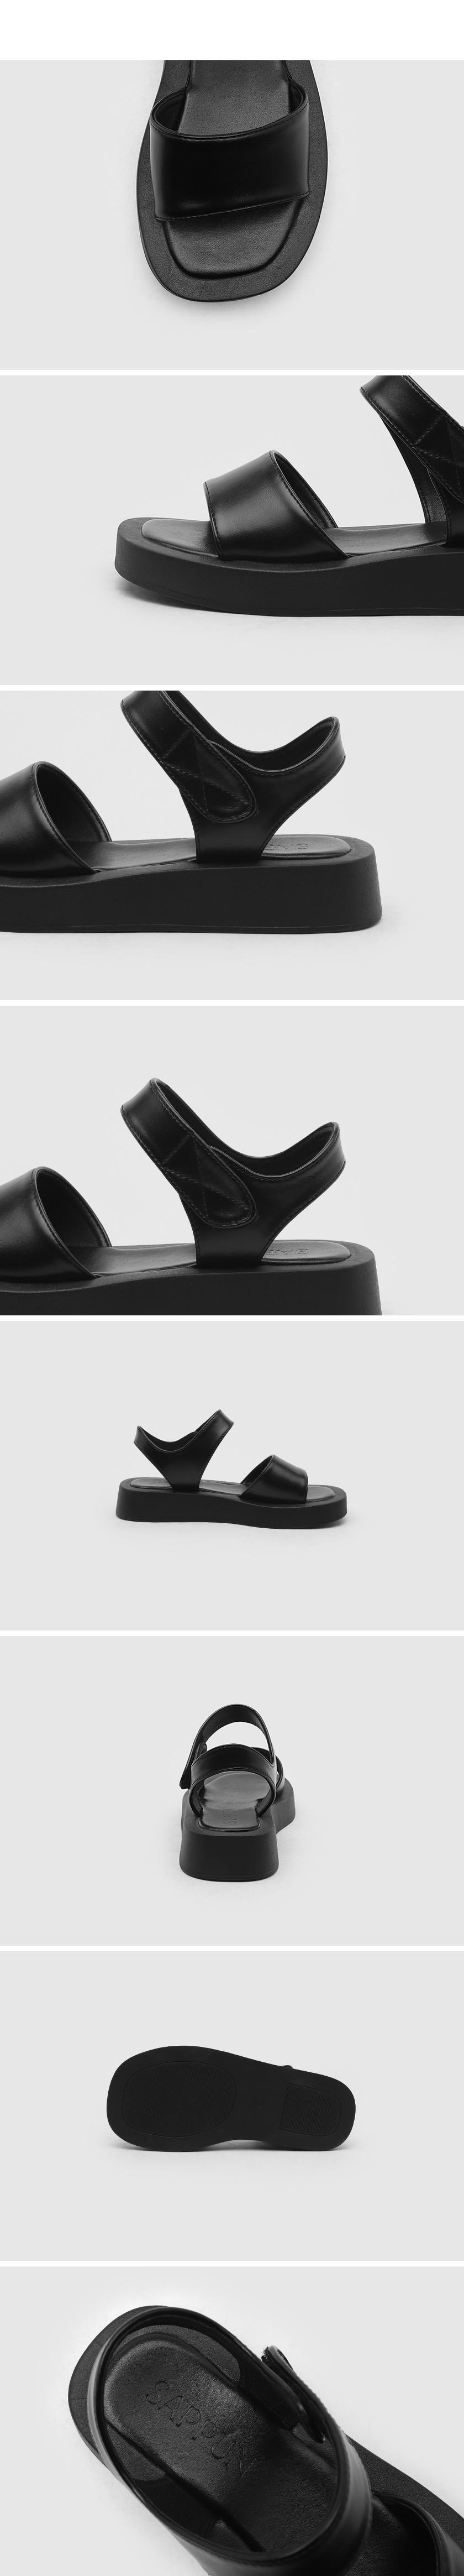 Verice Strap Sandals